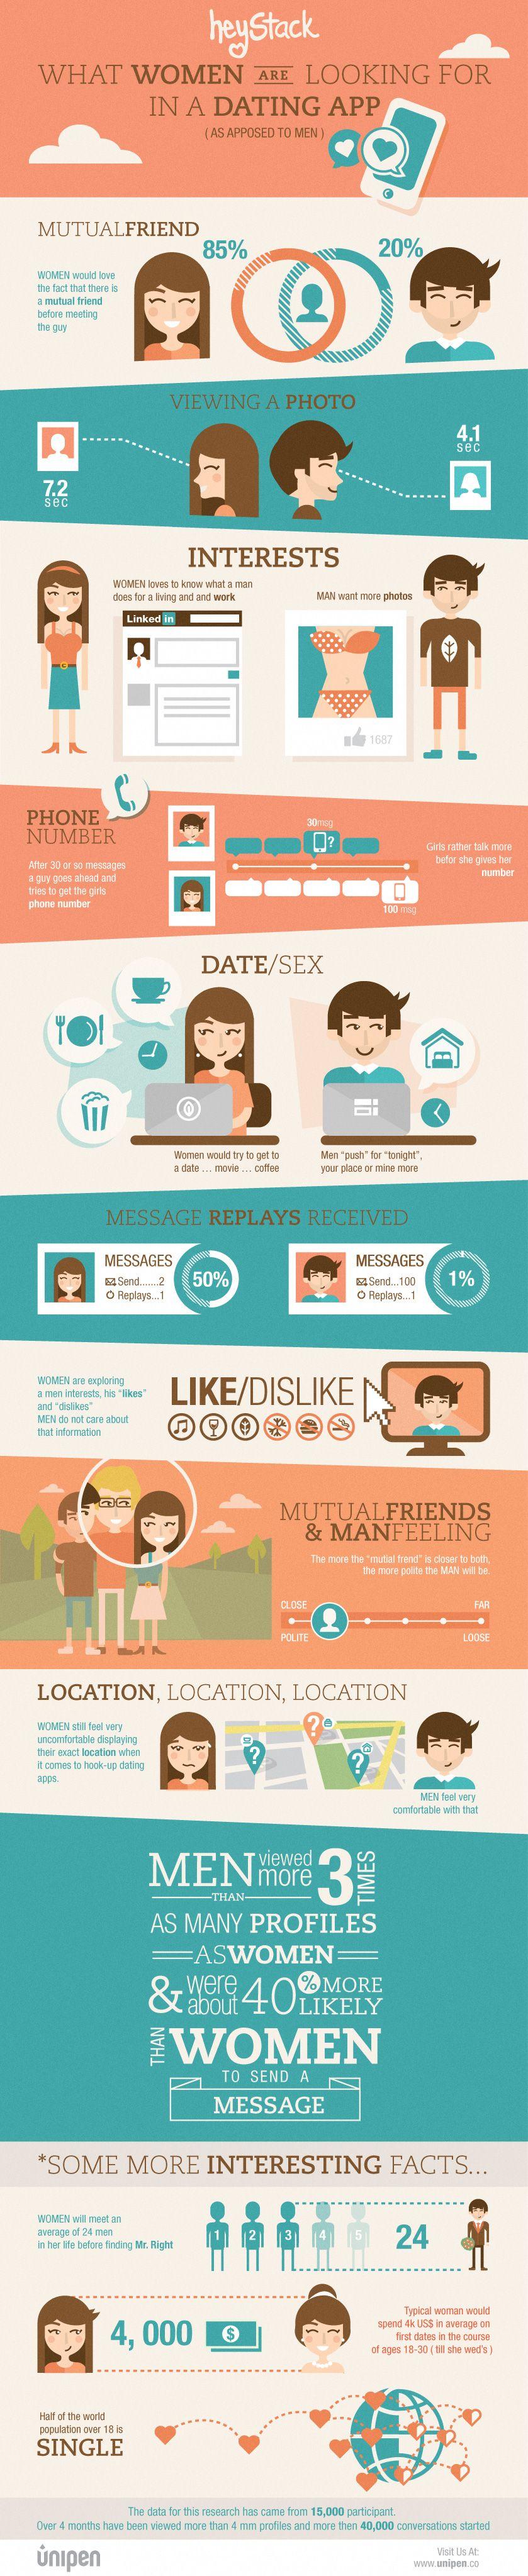 top aplicatii dating pčinja)